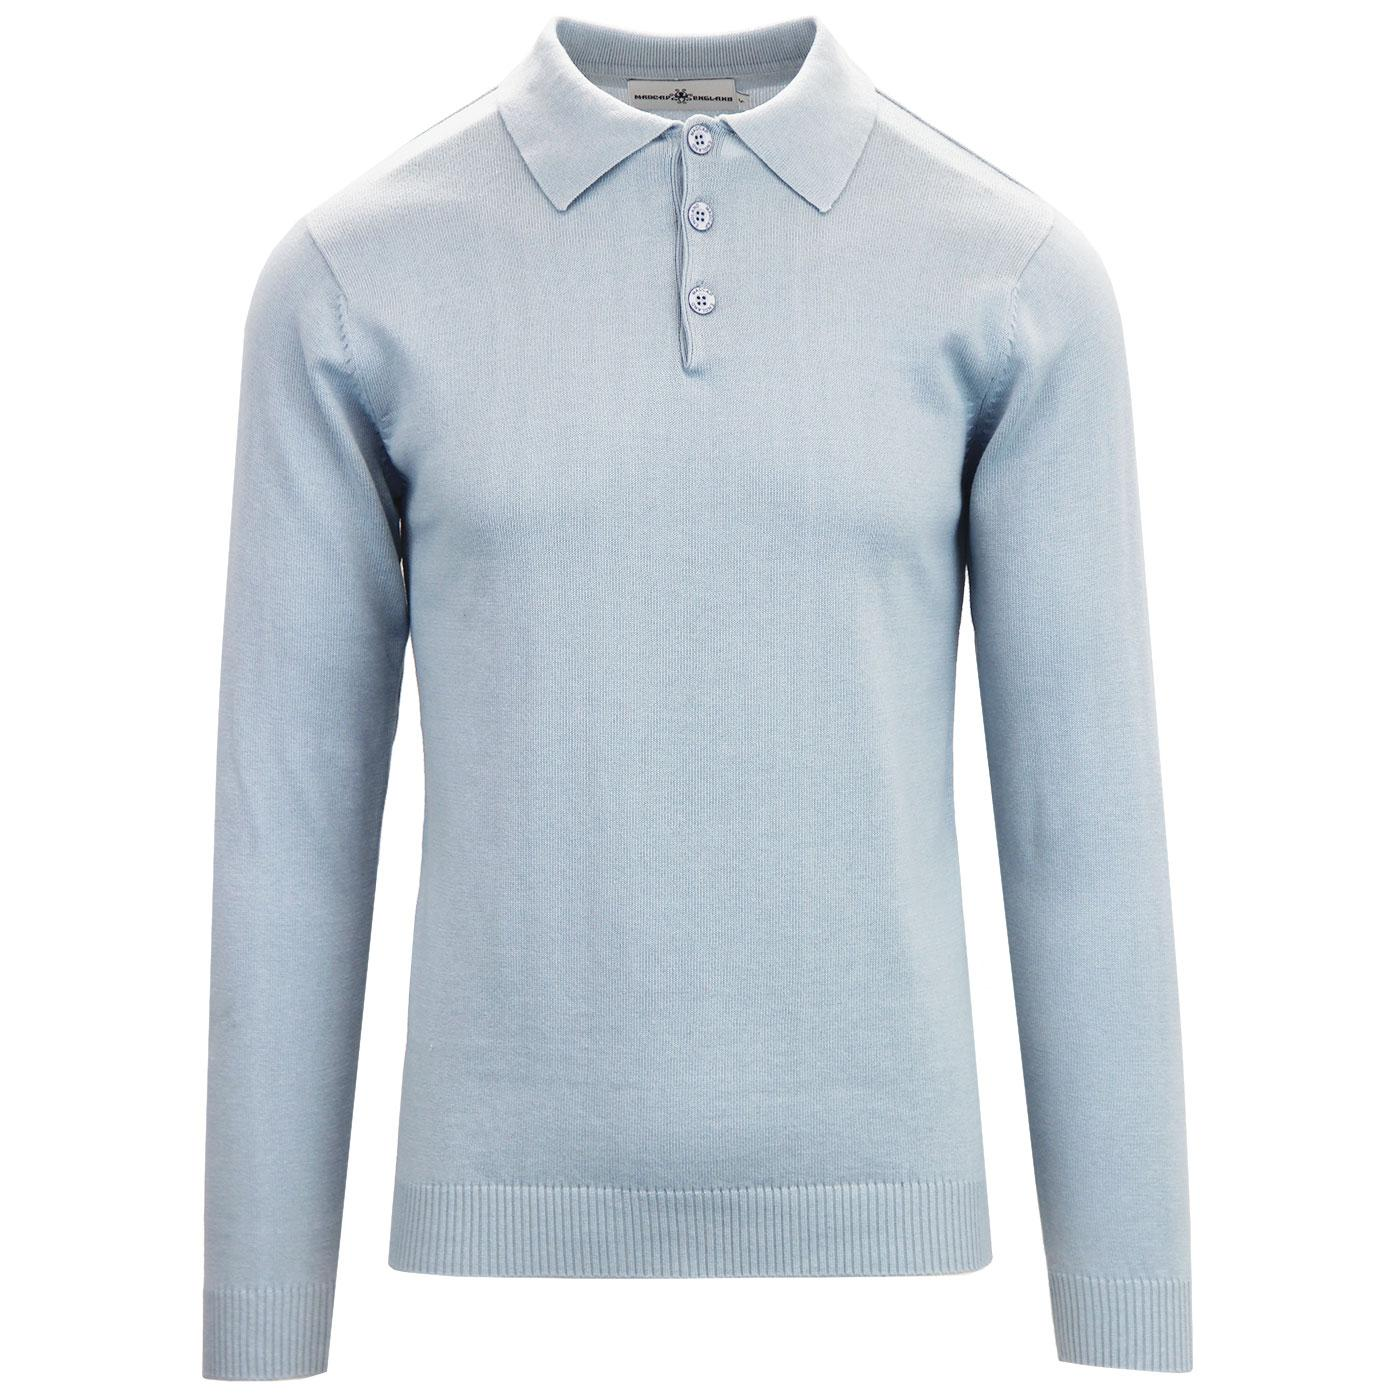 Brando MADCAP ENGLAND 1960s Mod Knitted Polo (BF)